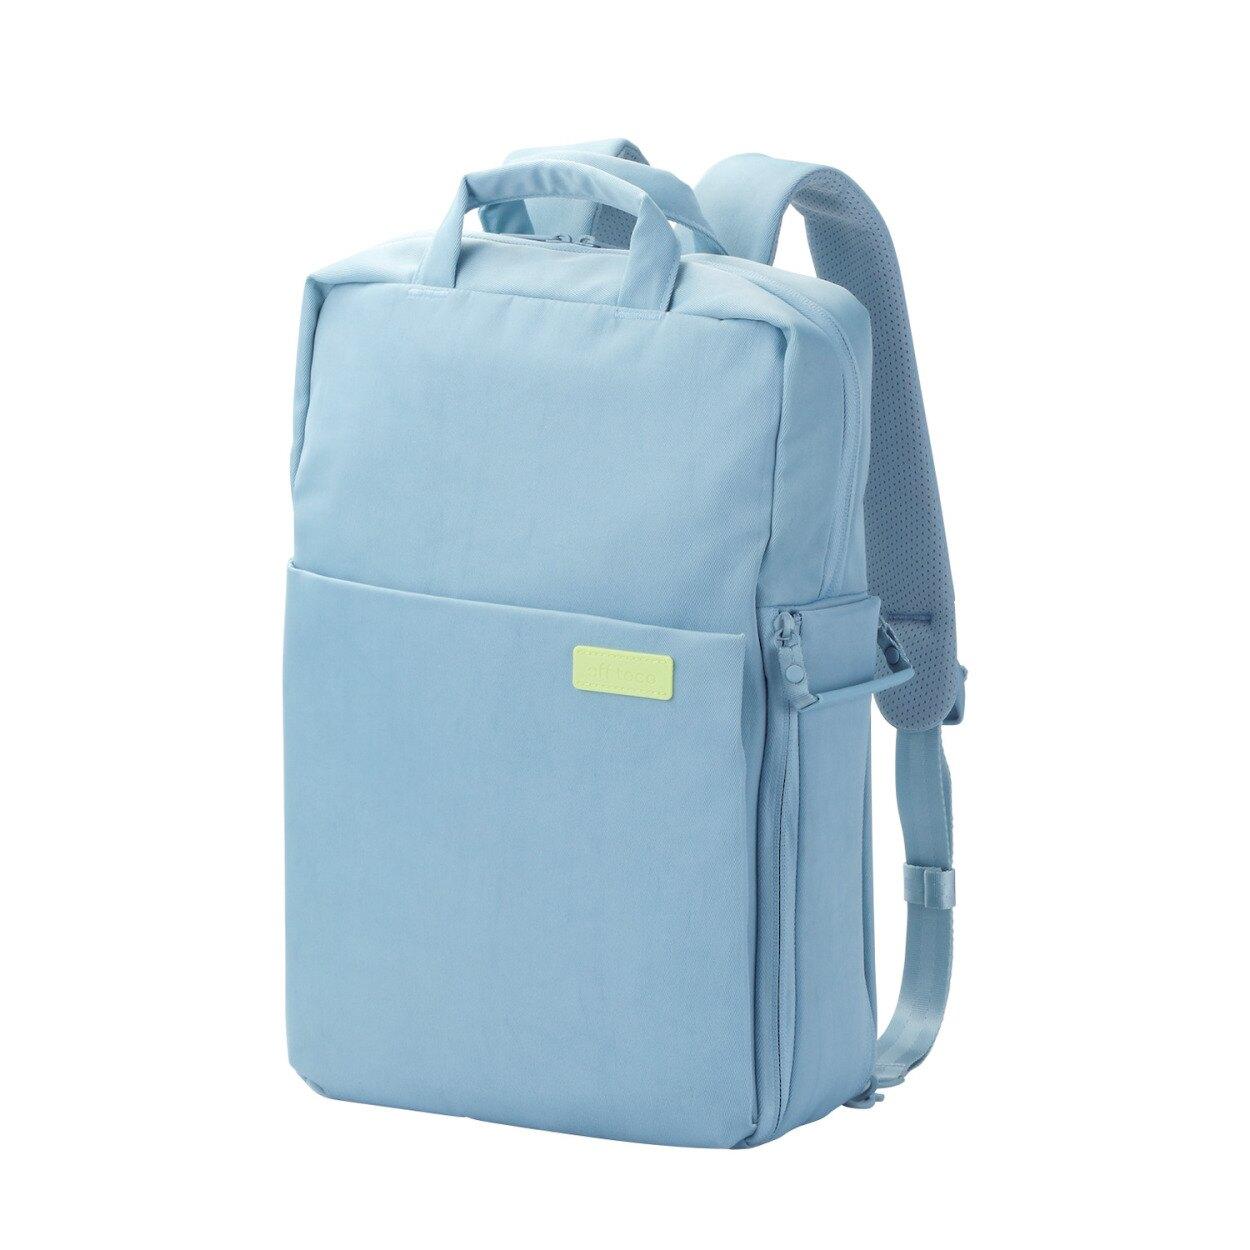 ELECOM 帆布3WAY薄型後背包(大) OF04 粉藍